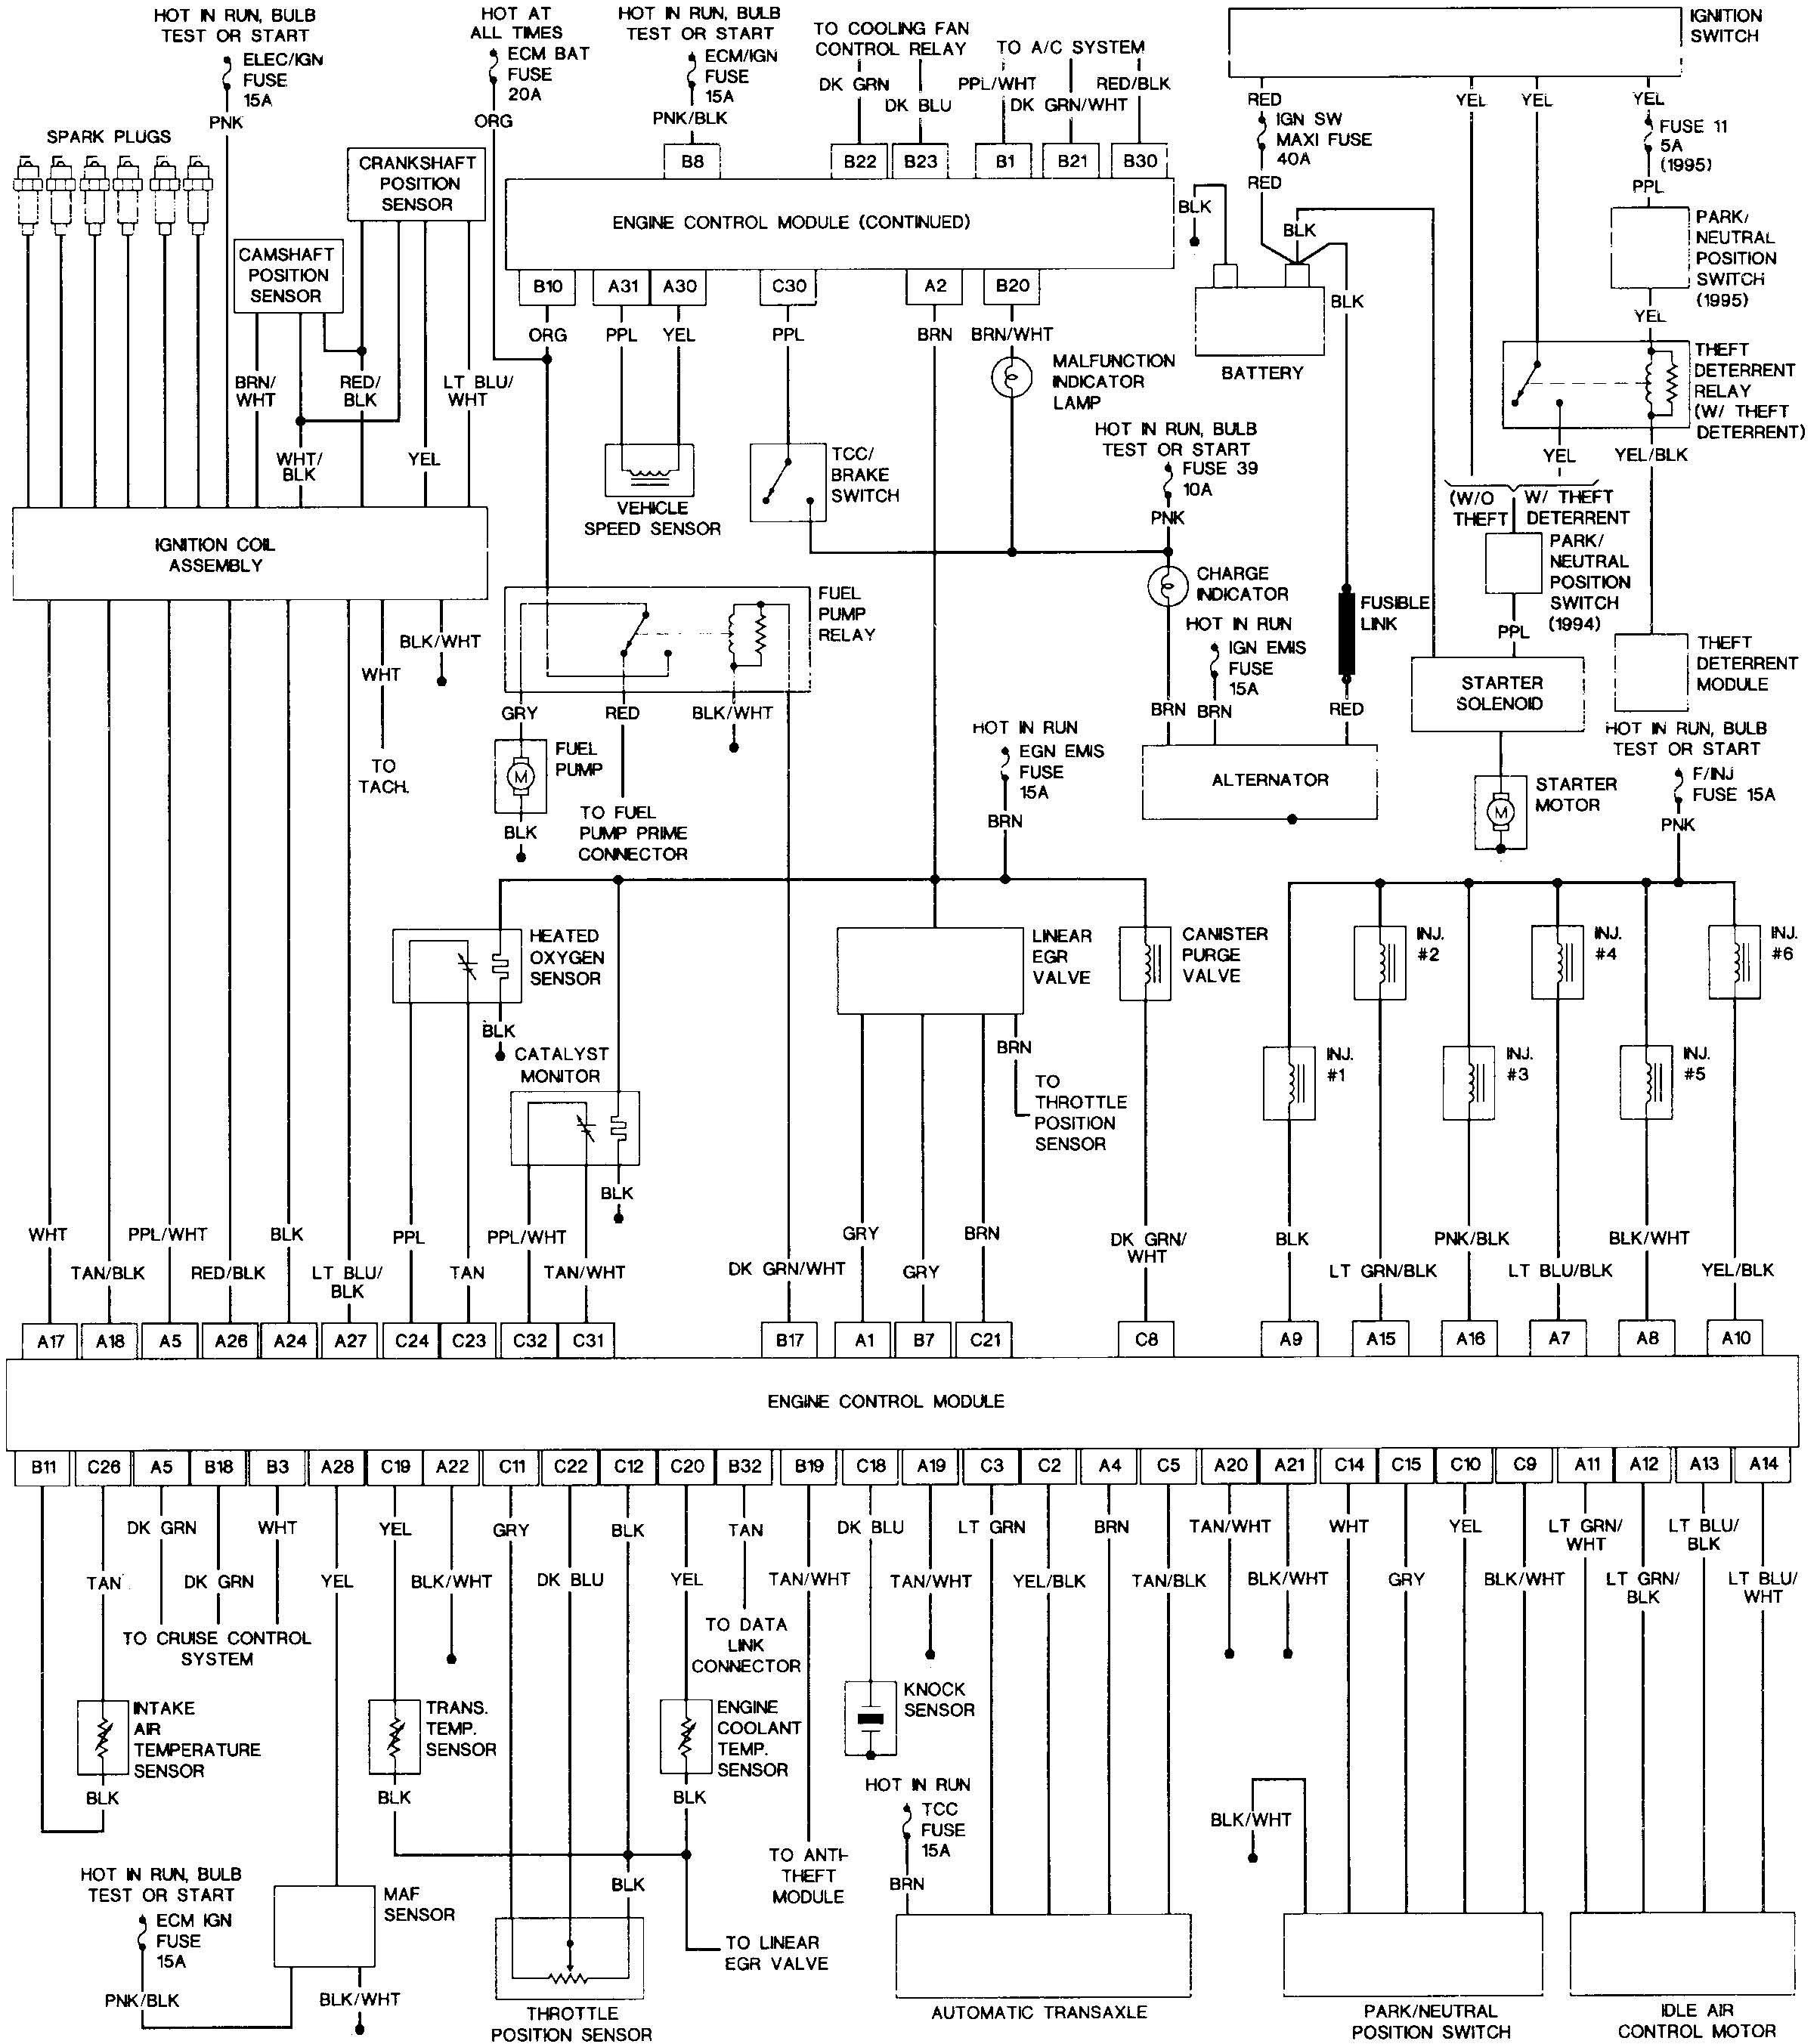 [GJFJ_338]  DIAGRAM] 1998 Buick Park Avenue Maf Wiring Diagram FULL Version HD Quality Wiring  Diagram - LOLDATABASE.CONSERVATOIRE-CHANTERIE.FR | Buick Park Avenue Engine Wiring Diagram |  | loldatabase.conservatoire-chanterie.fr